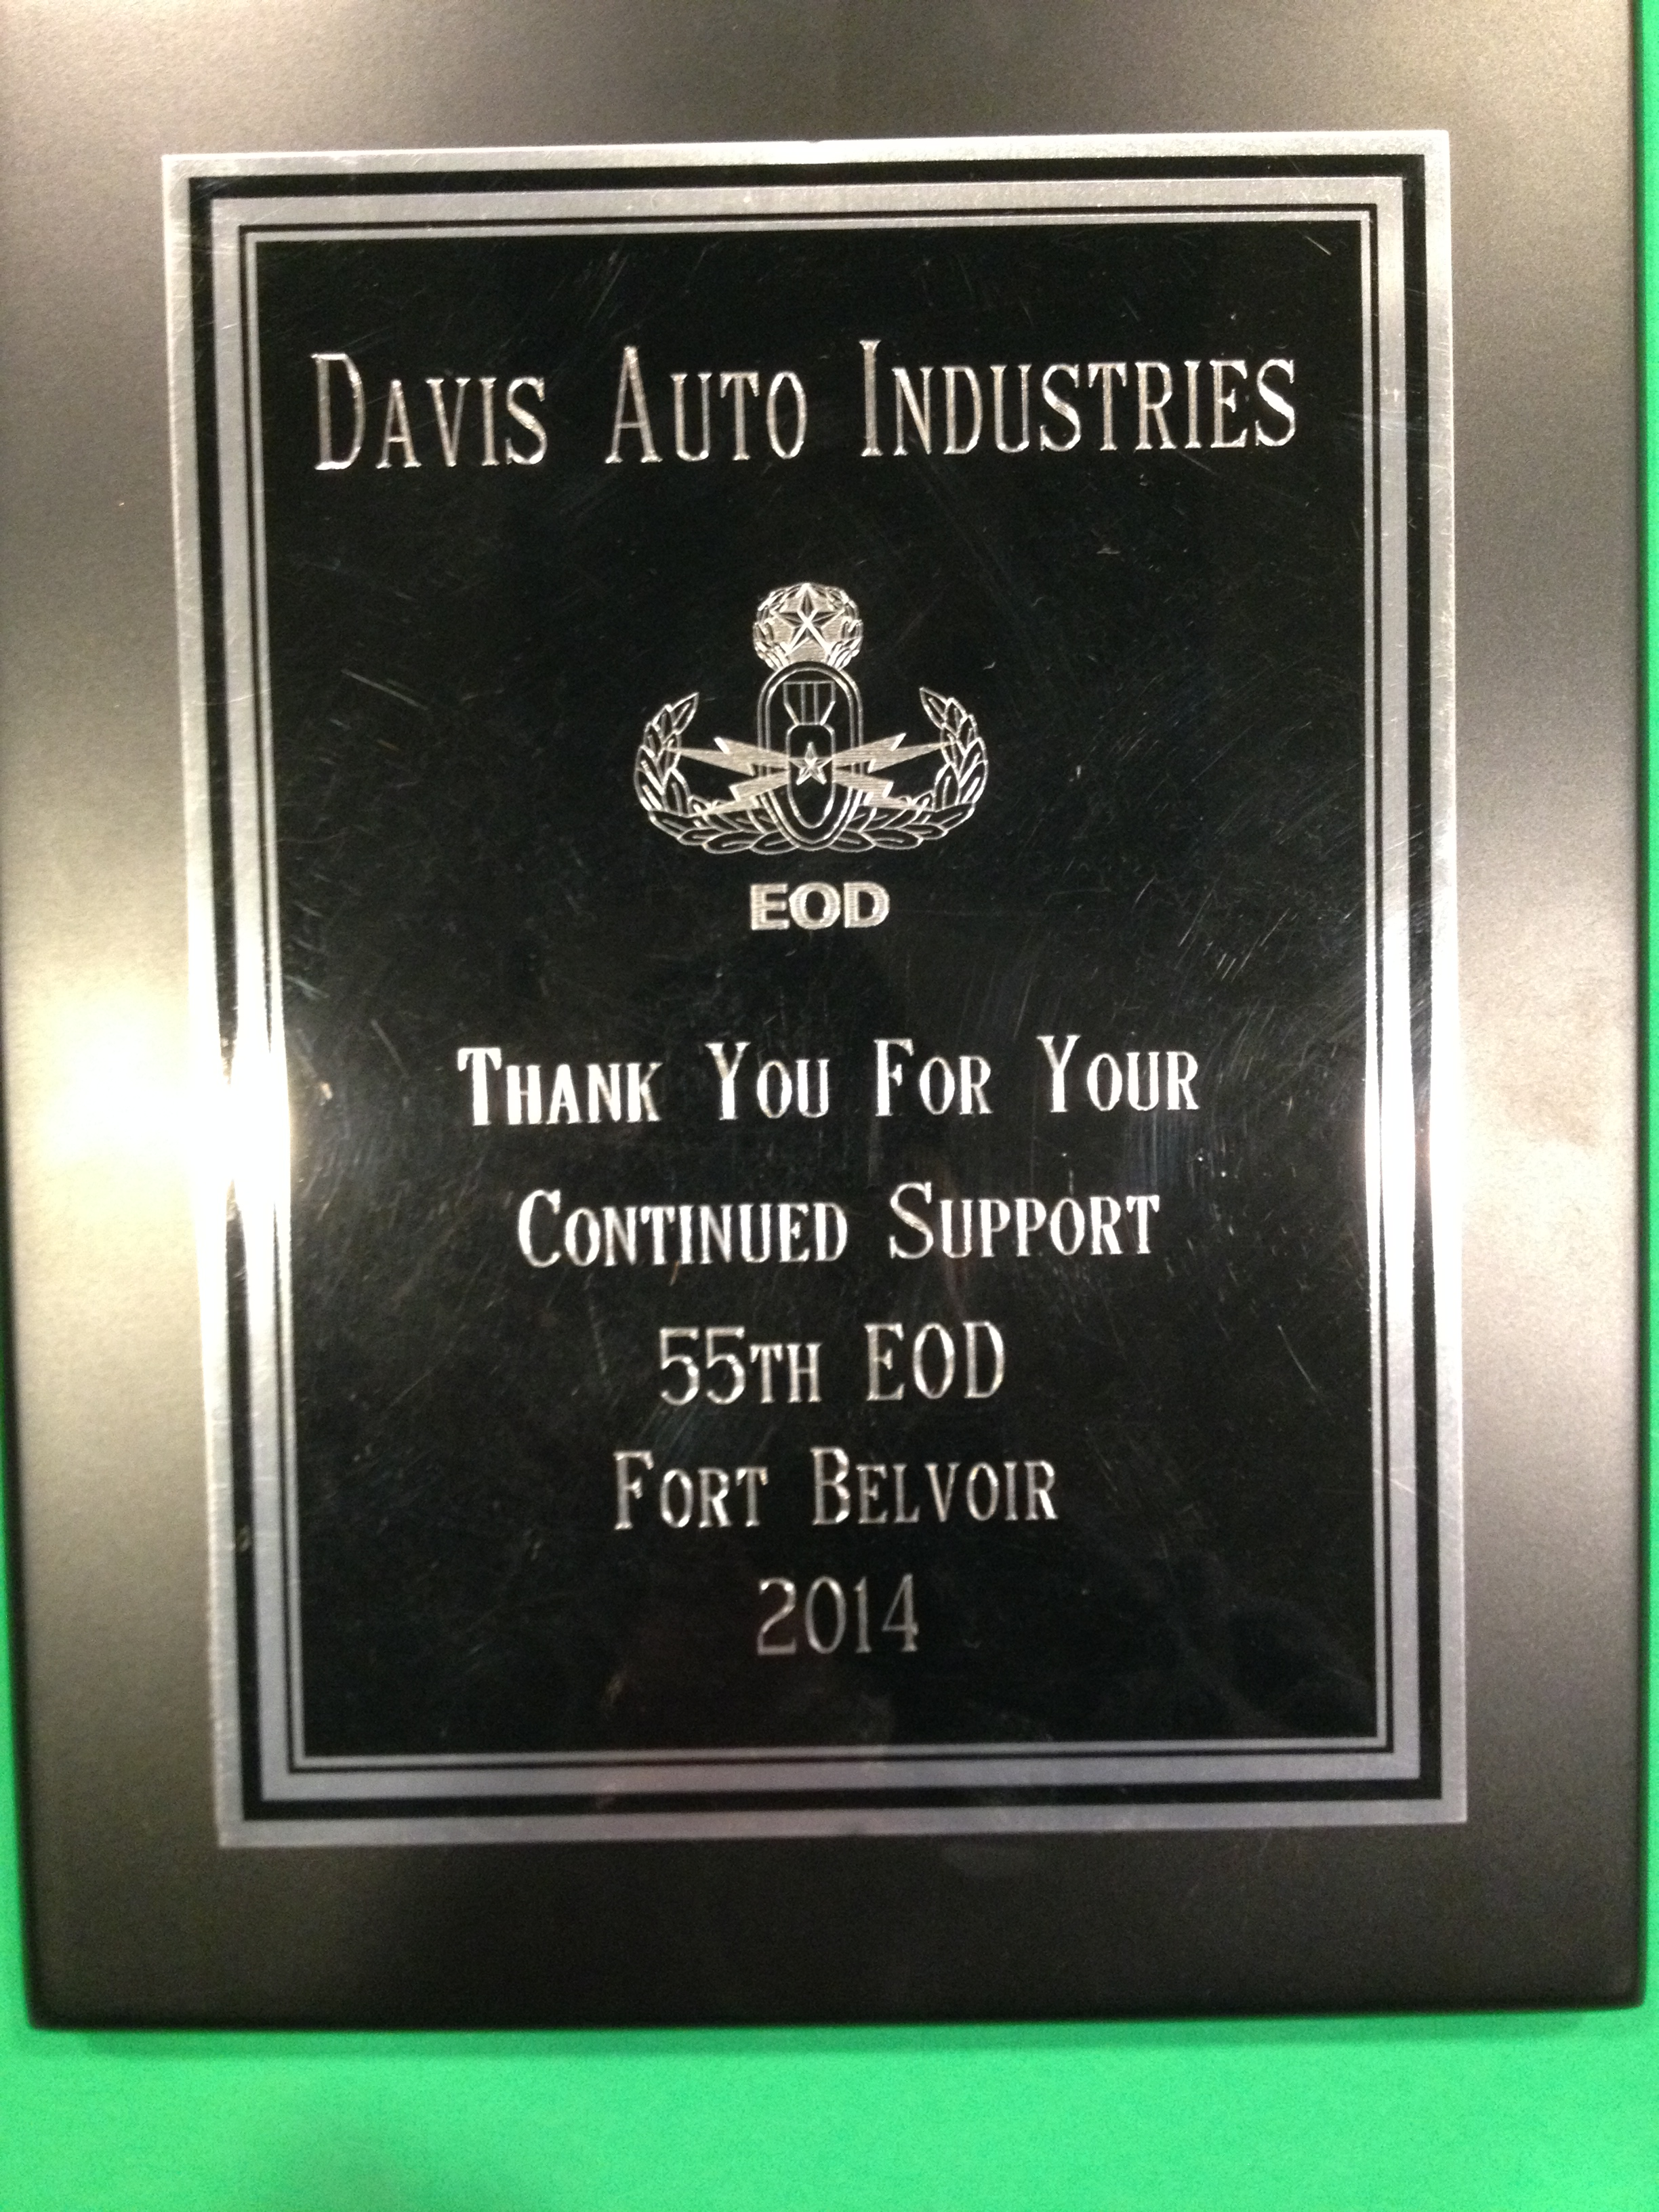 Davis Auto Industries